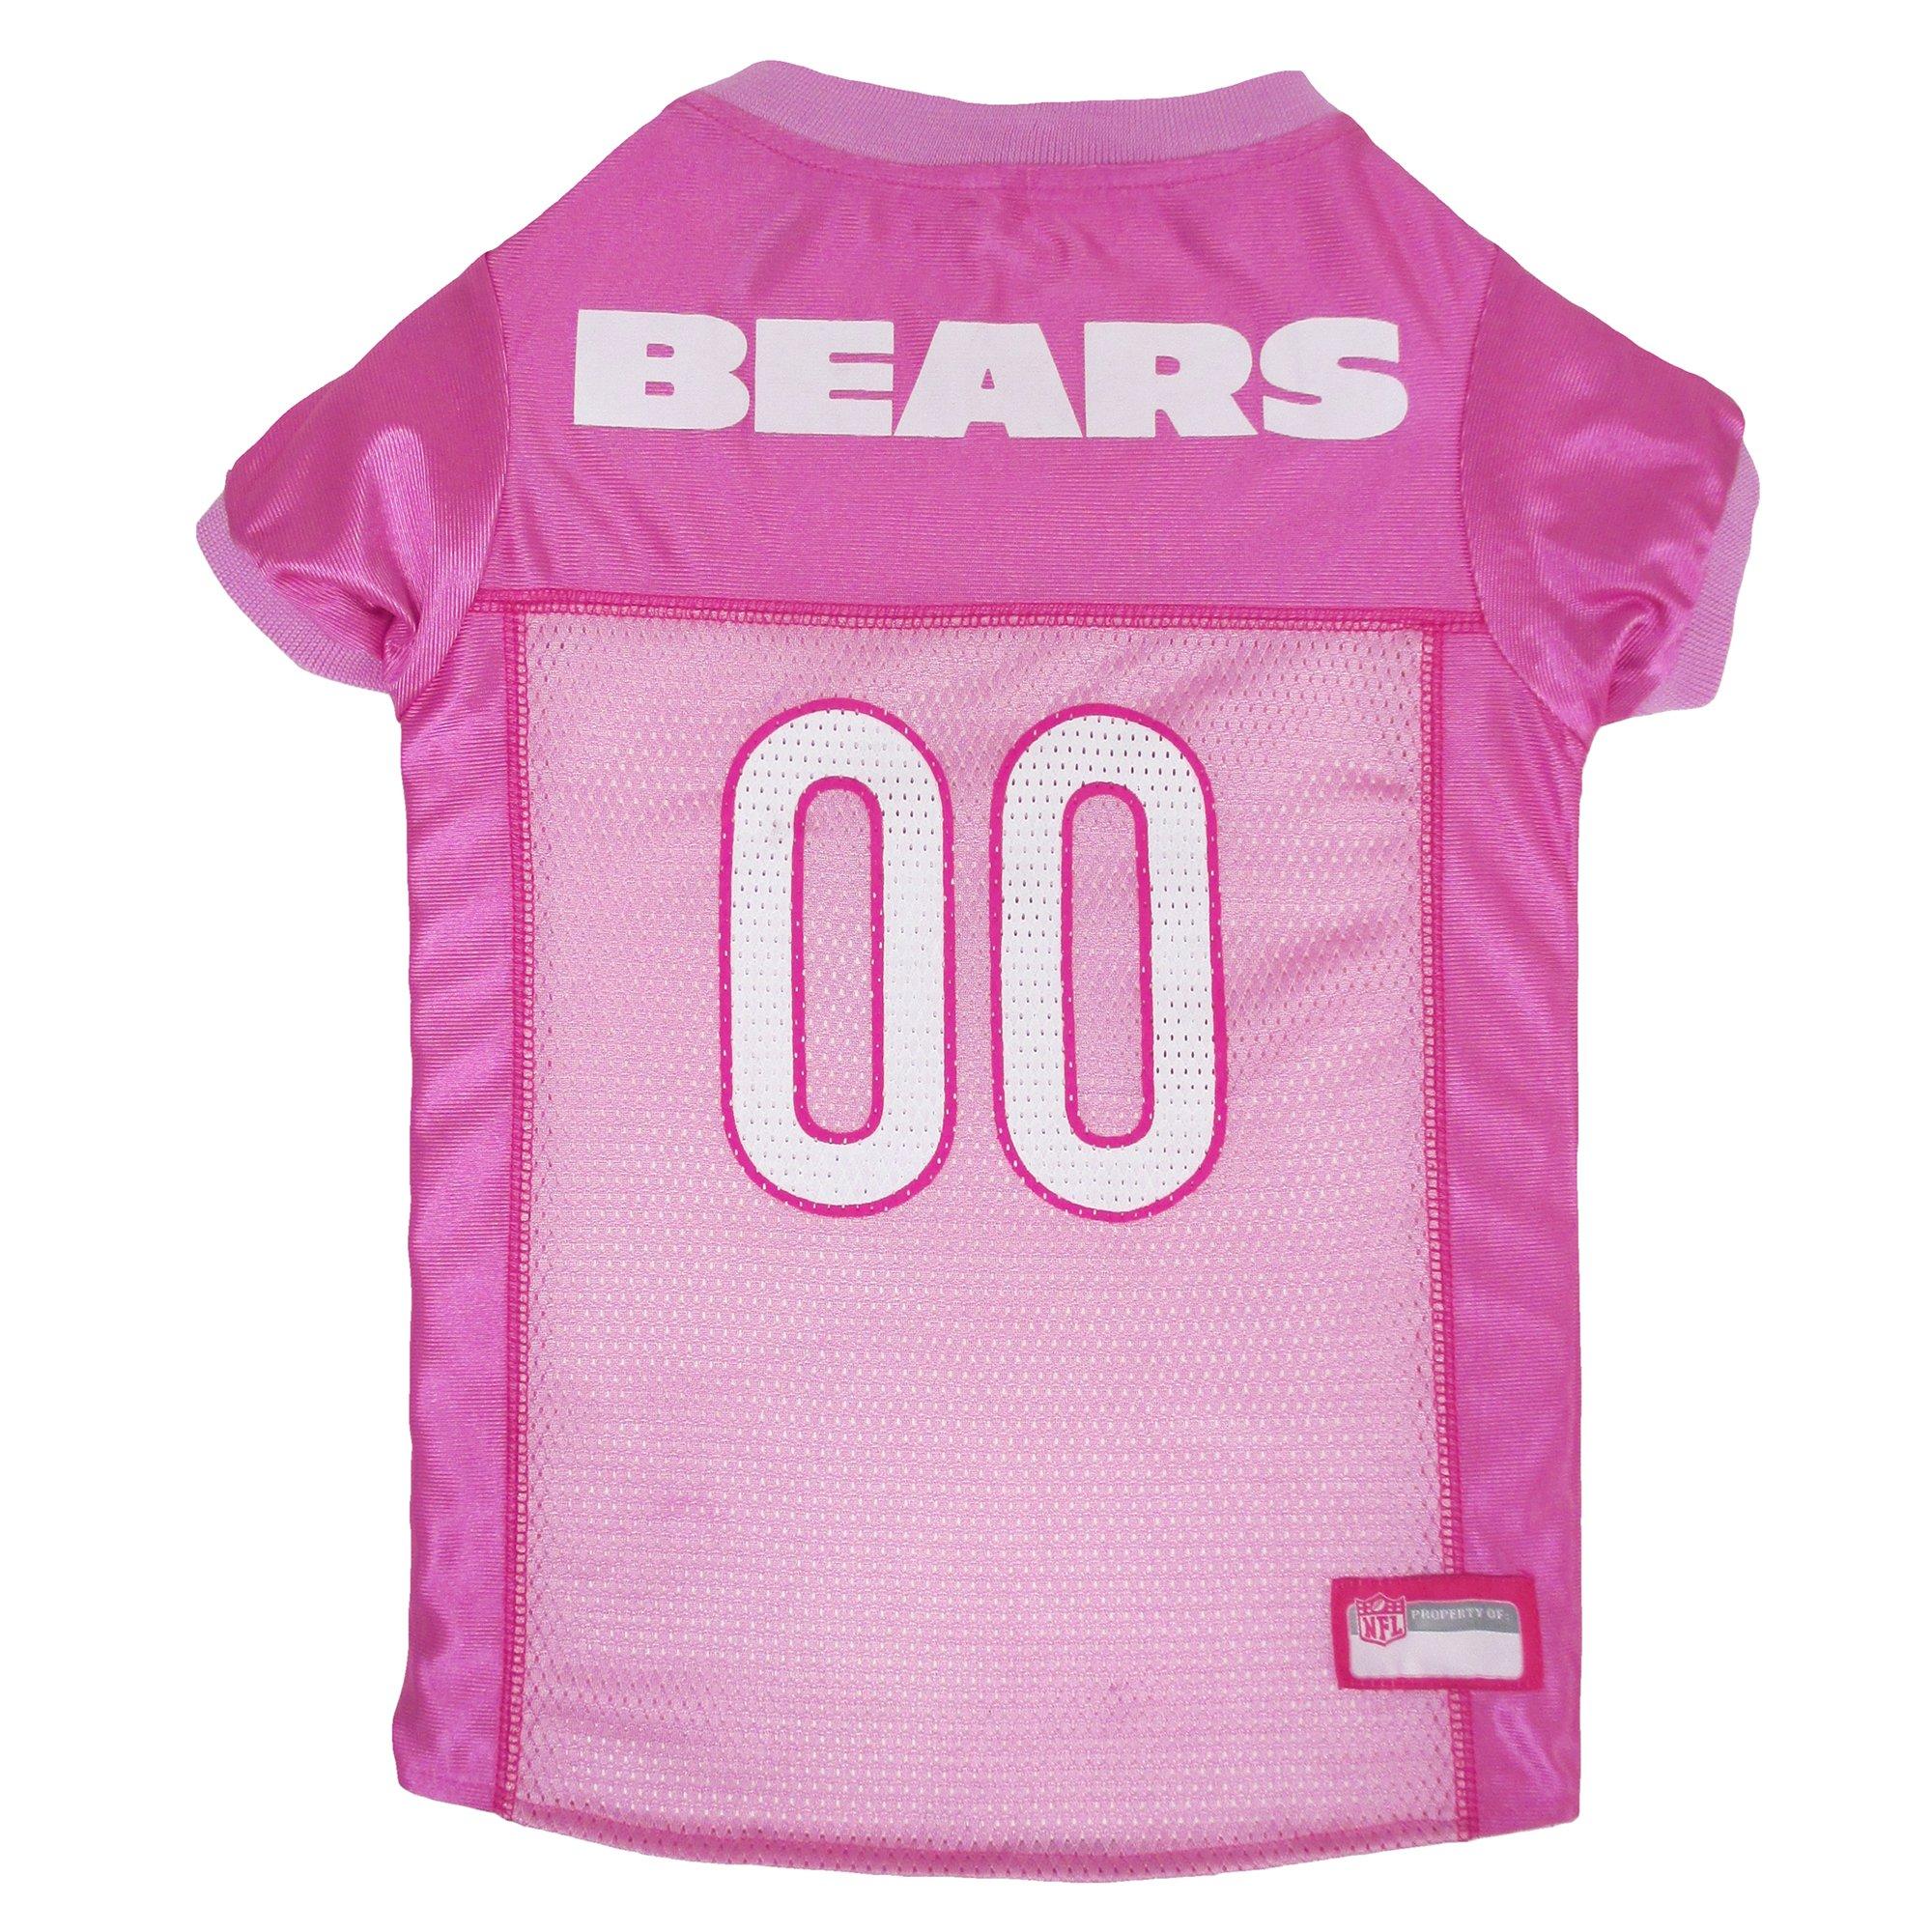 c729b09b382 Pets First Chicago Bears NFL Pink Mesh Jersey   Petco